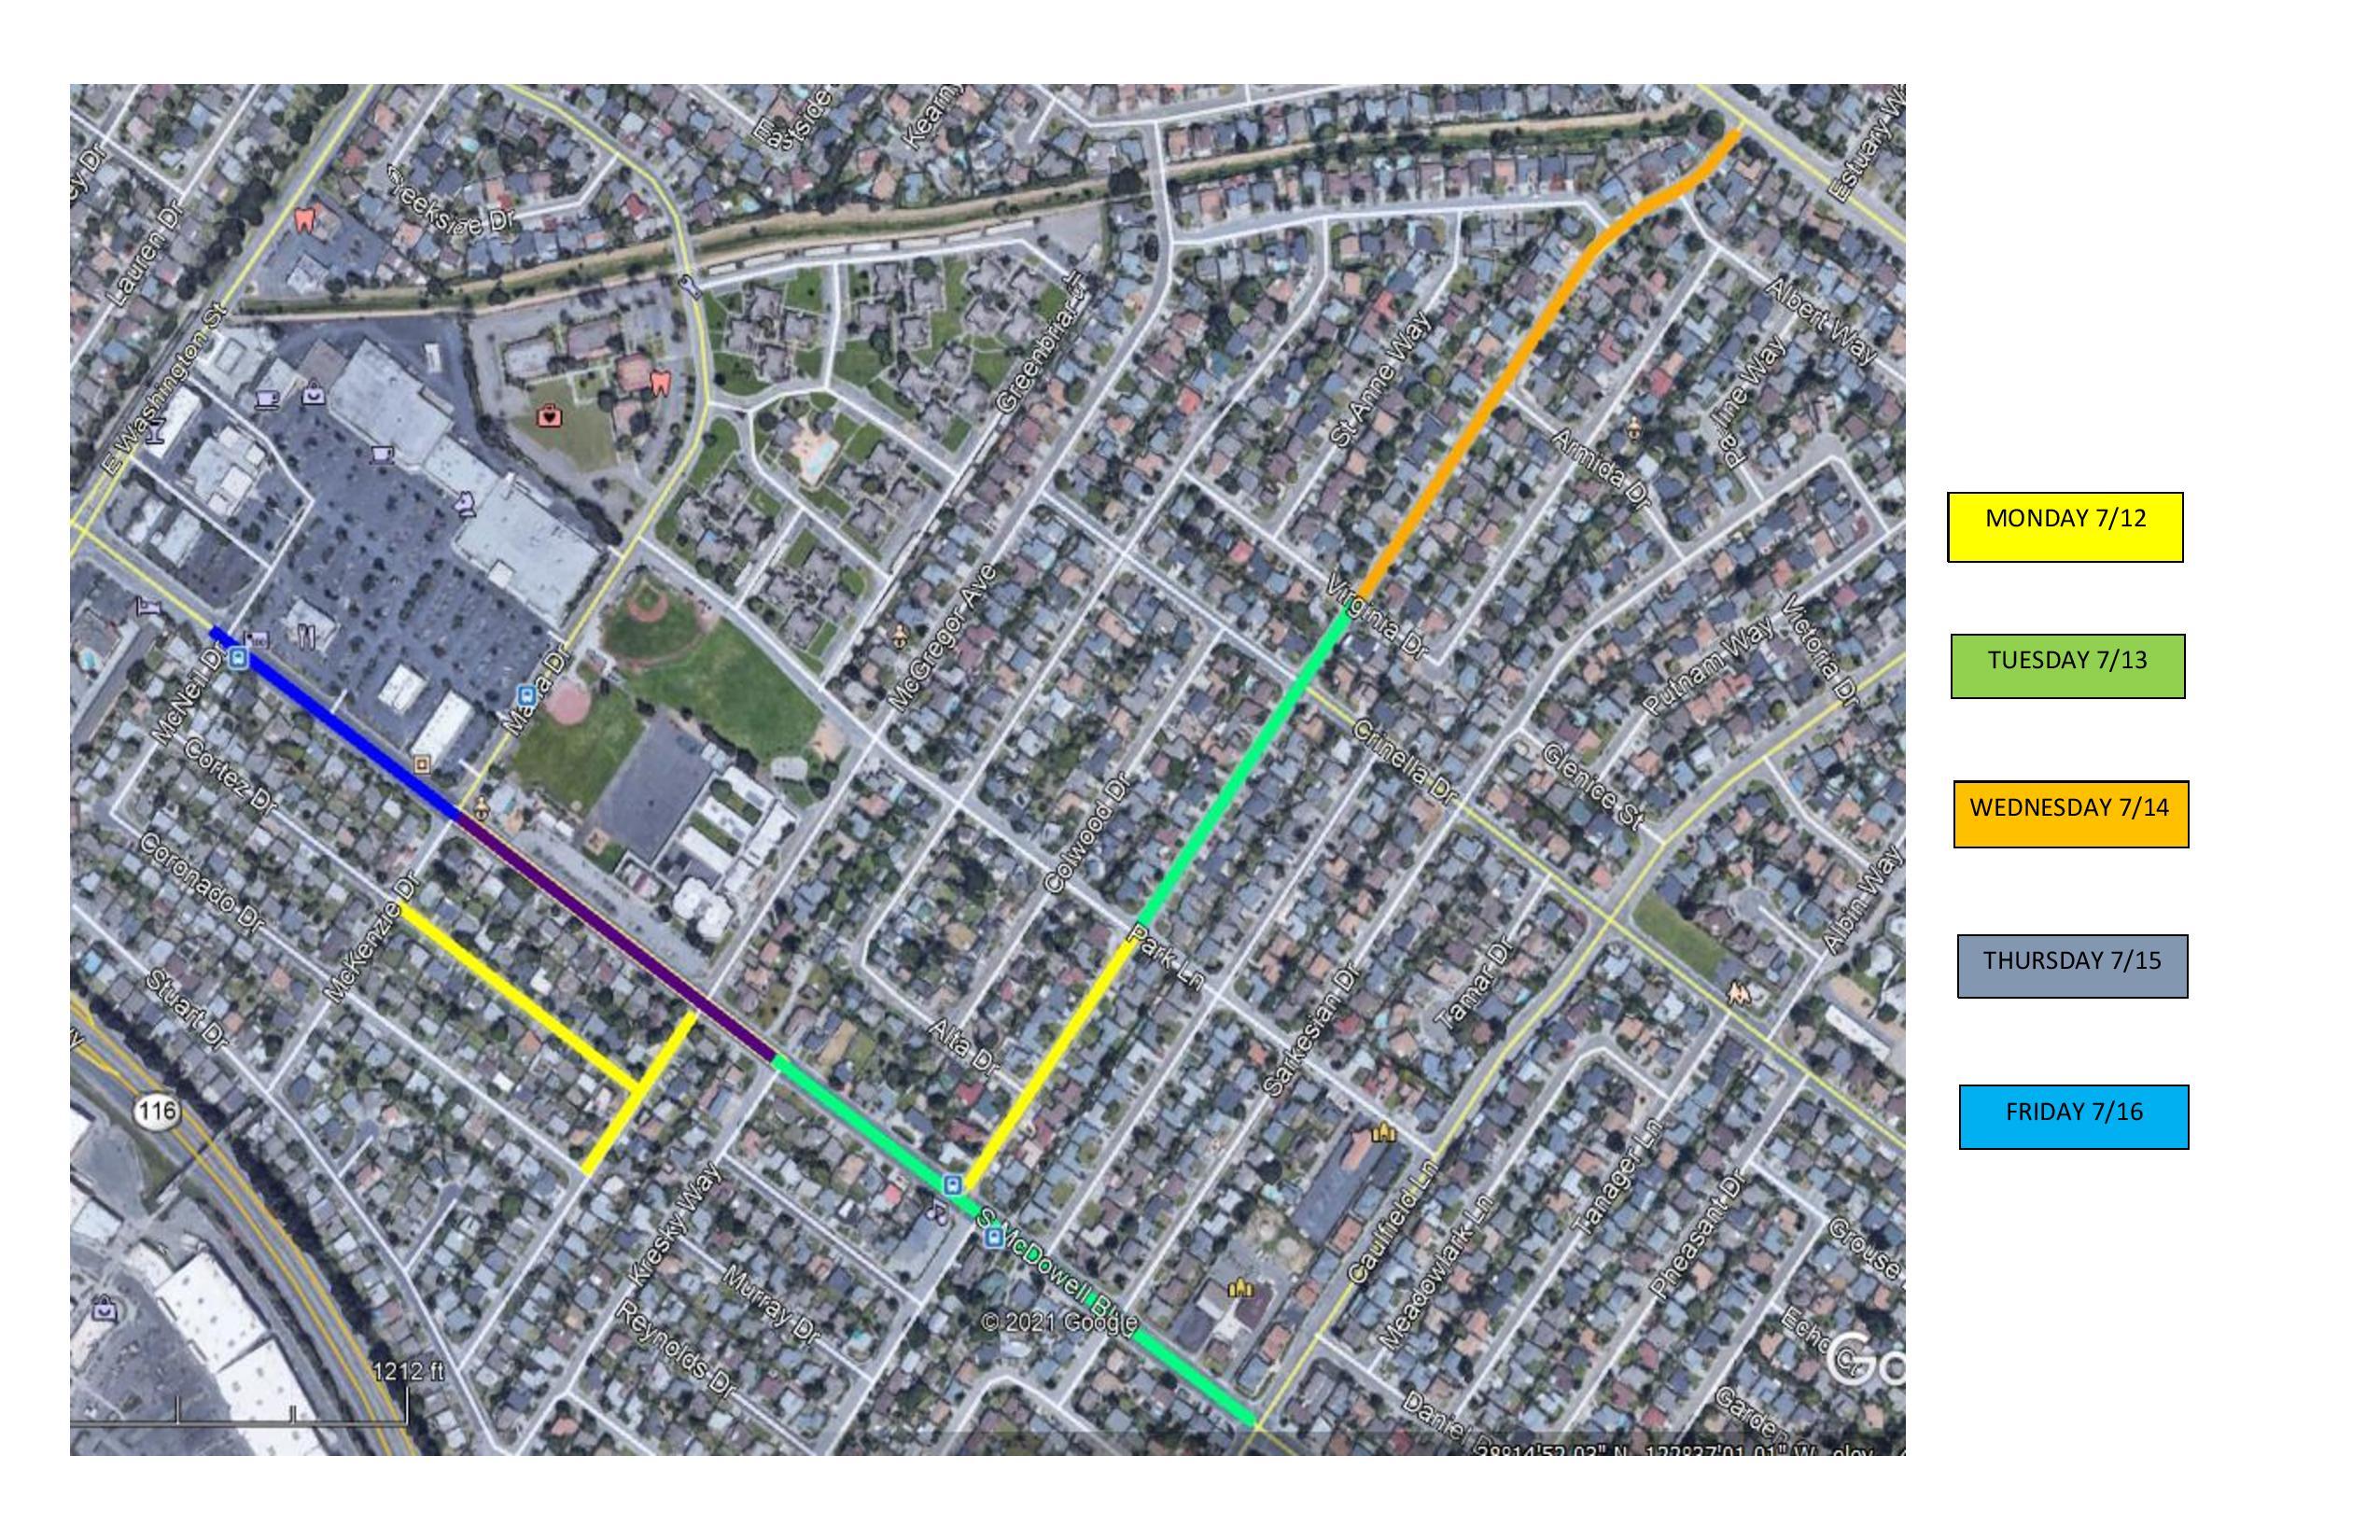 Pavement Map 2 7_12 thru 7_16